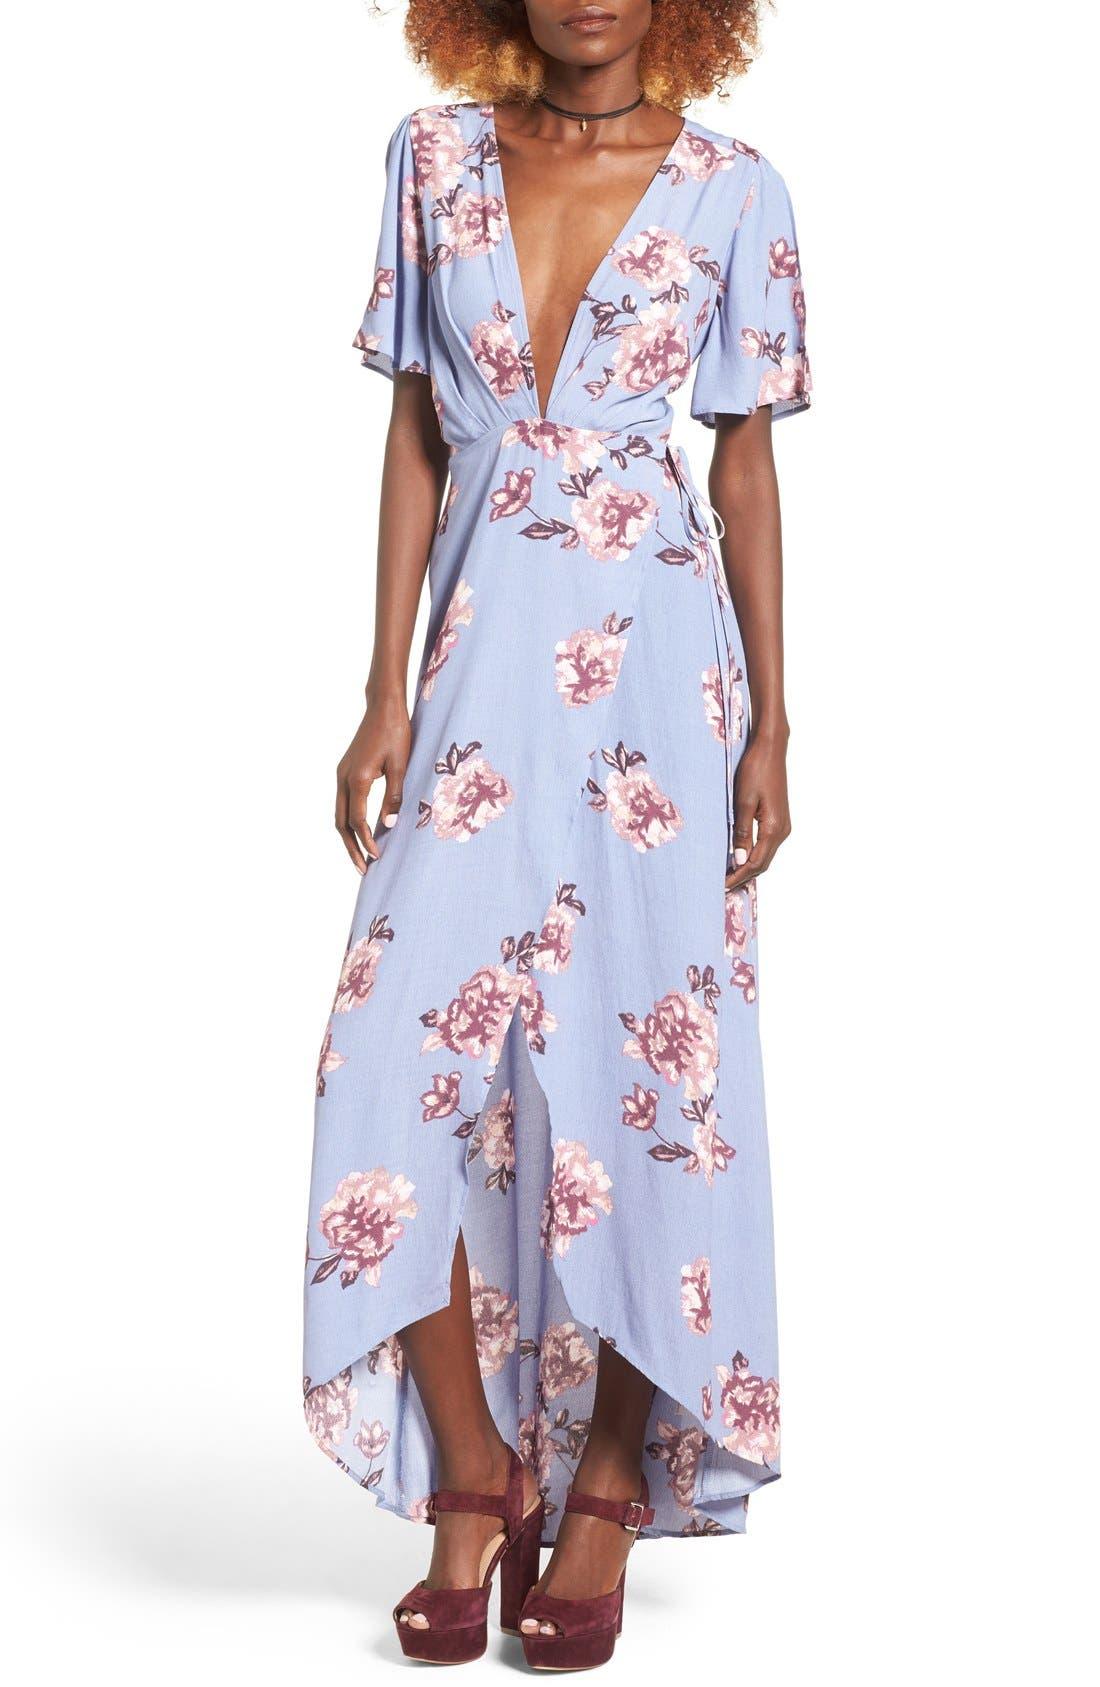 Alternate Image 1 Selected - ASTR Selma Floral Print Wrap Dress